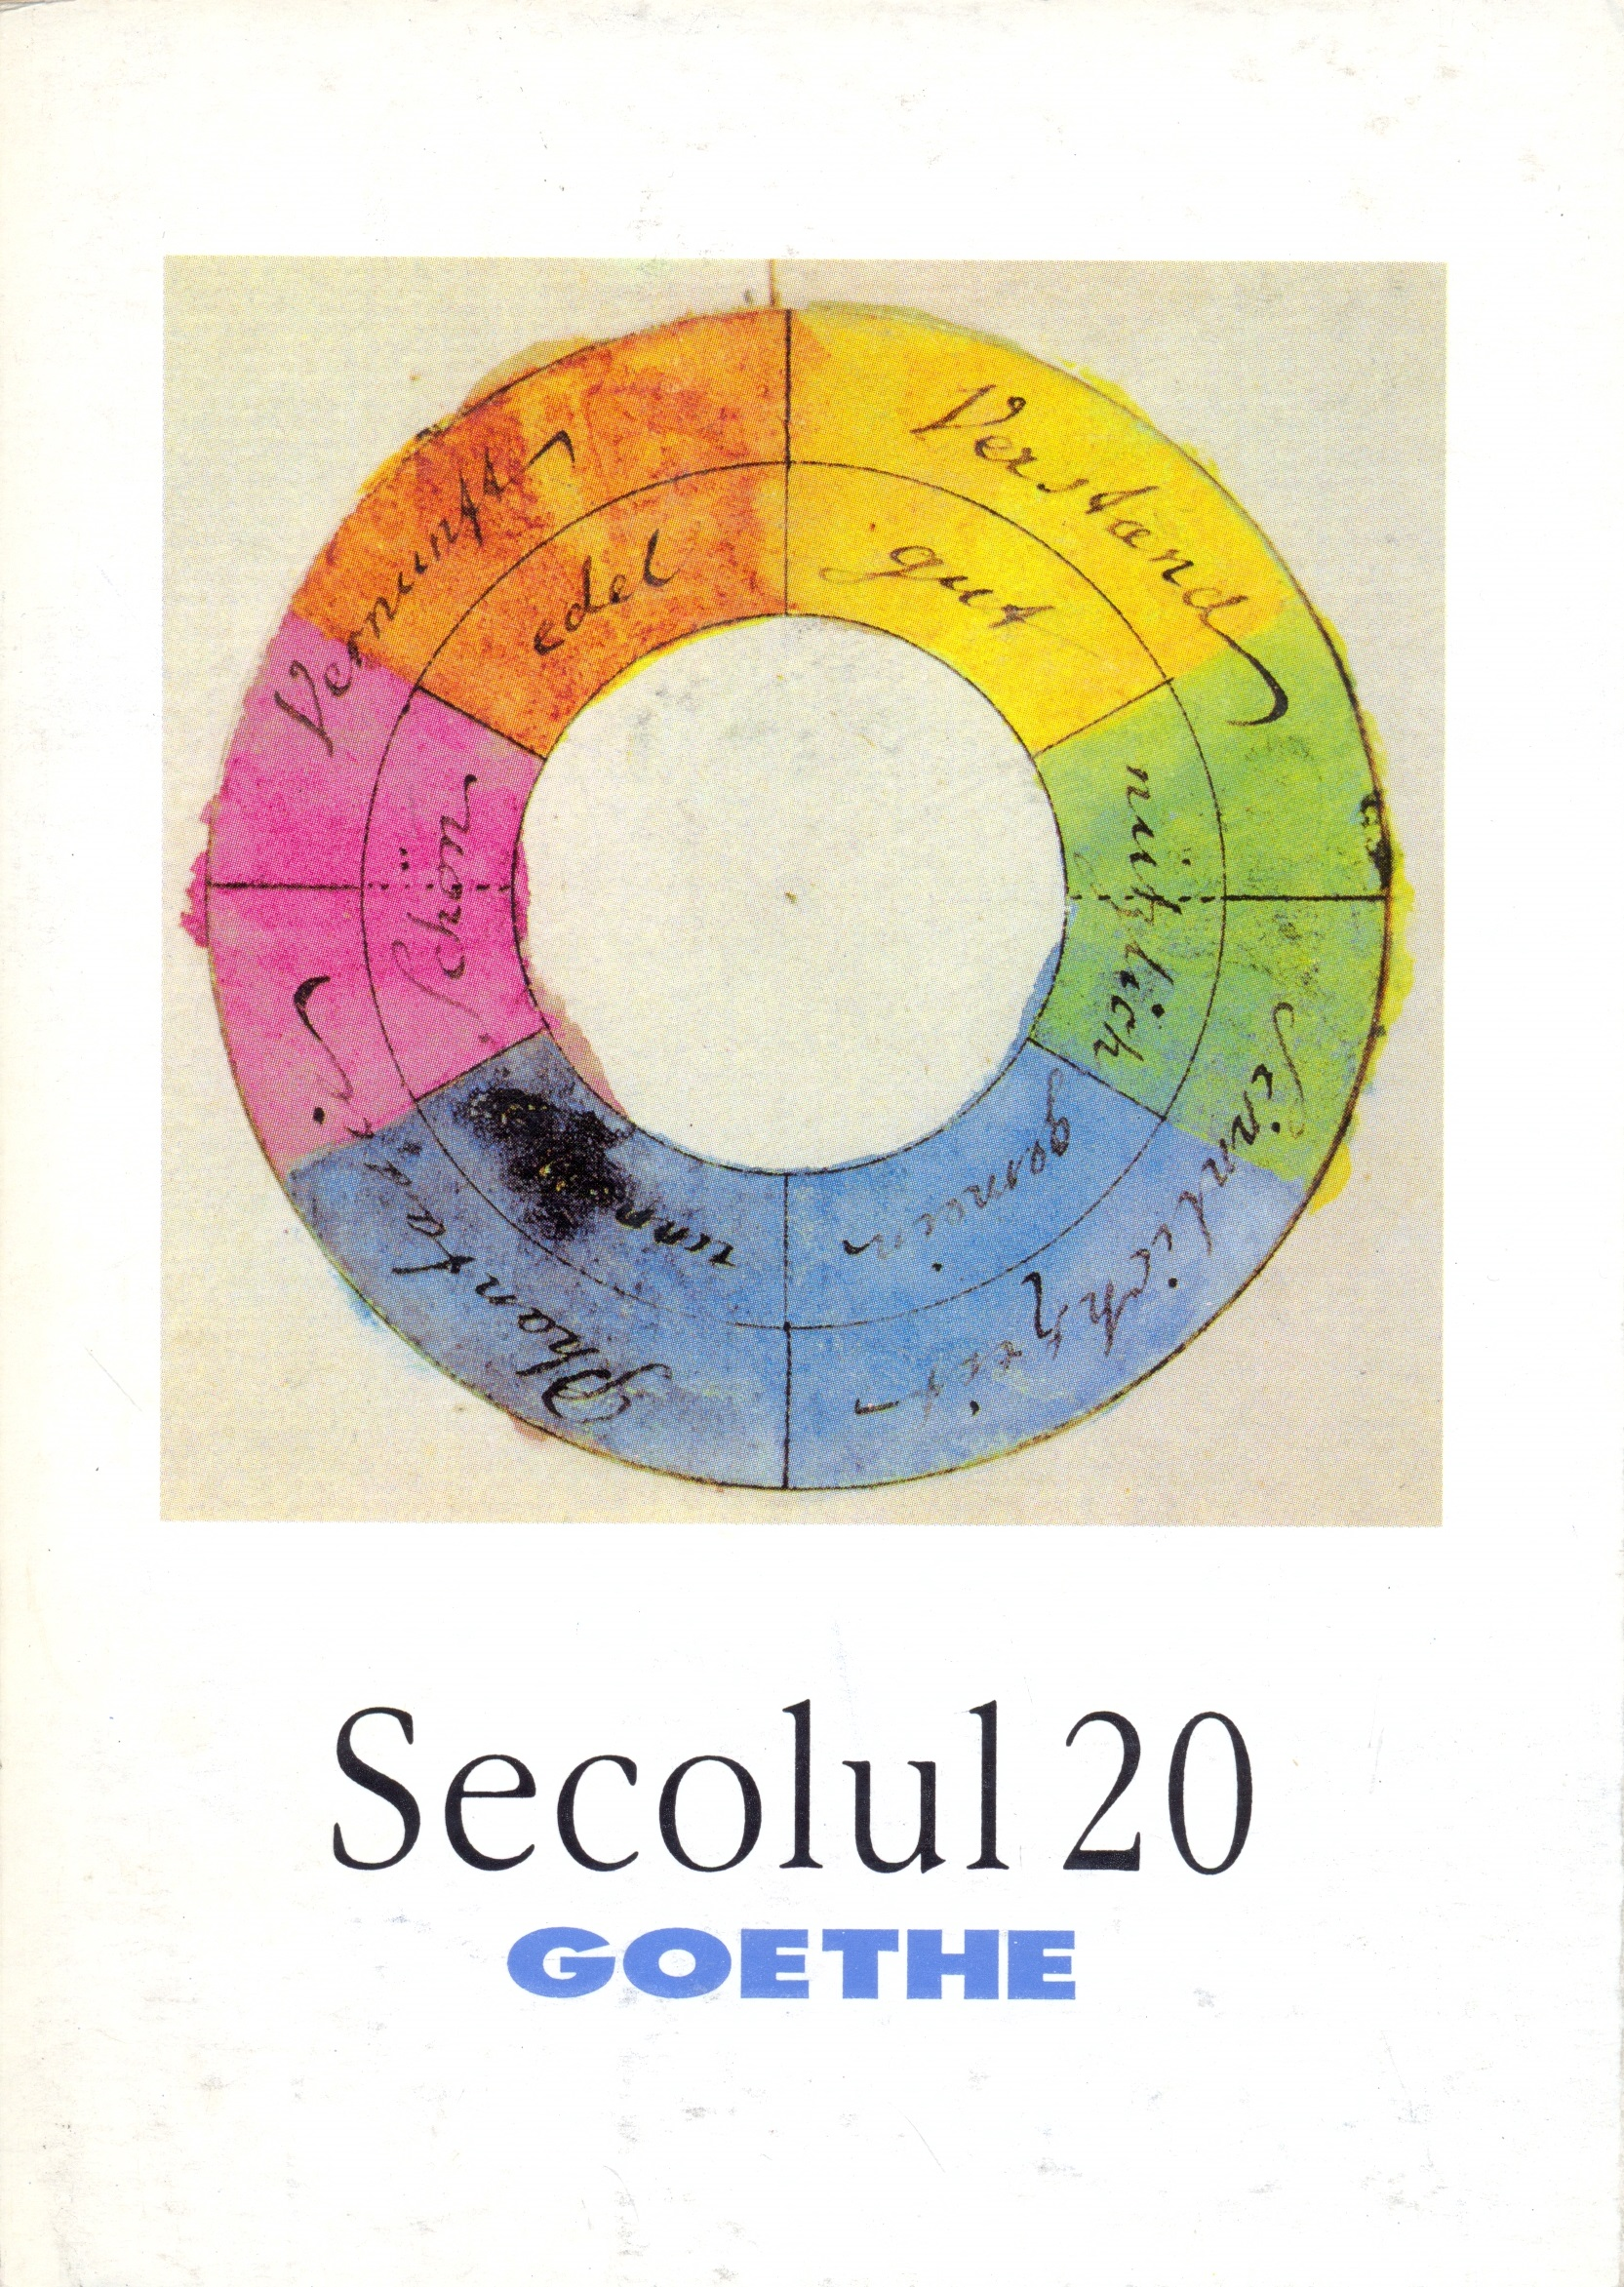 Secolul 20 - Goethe